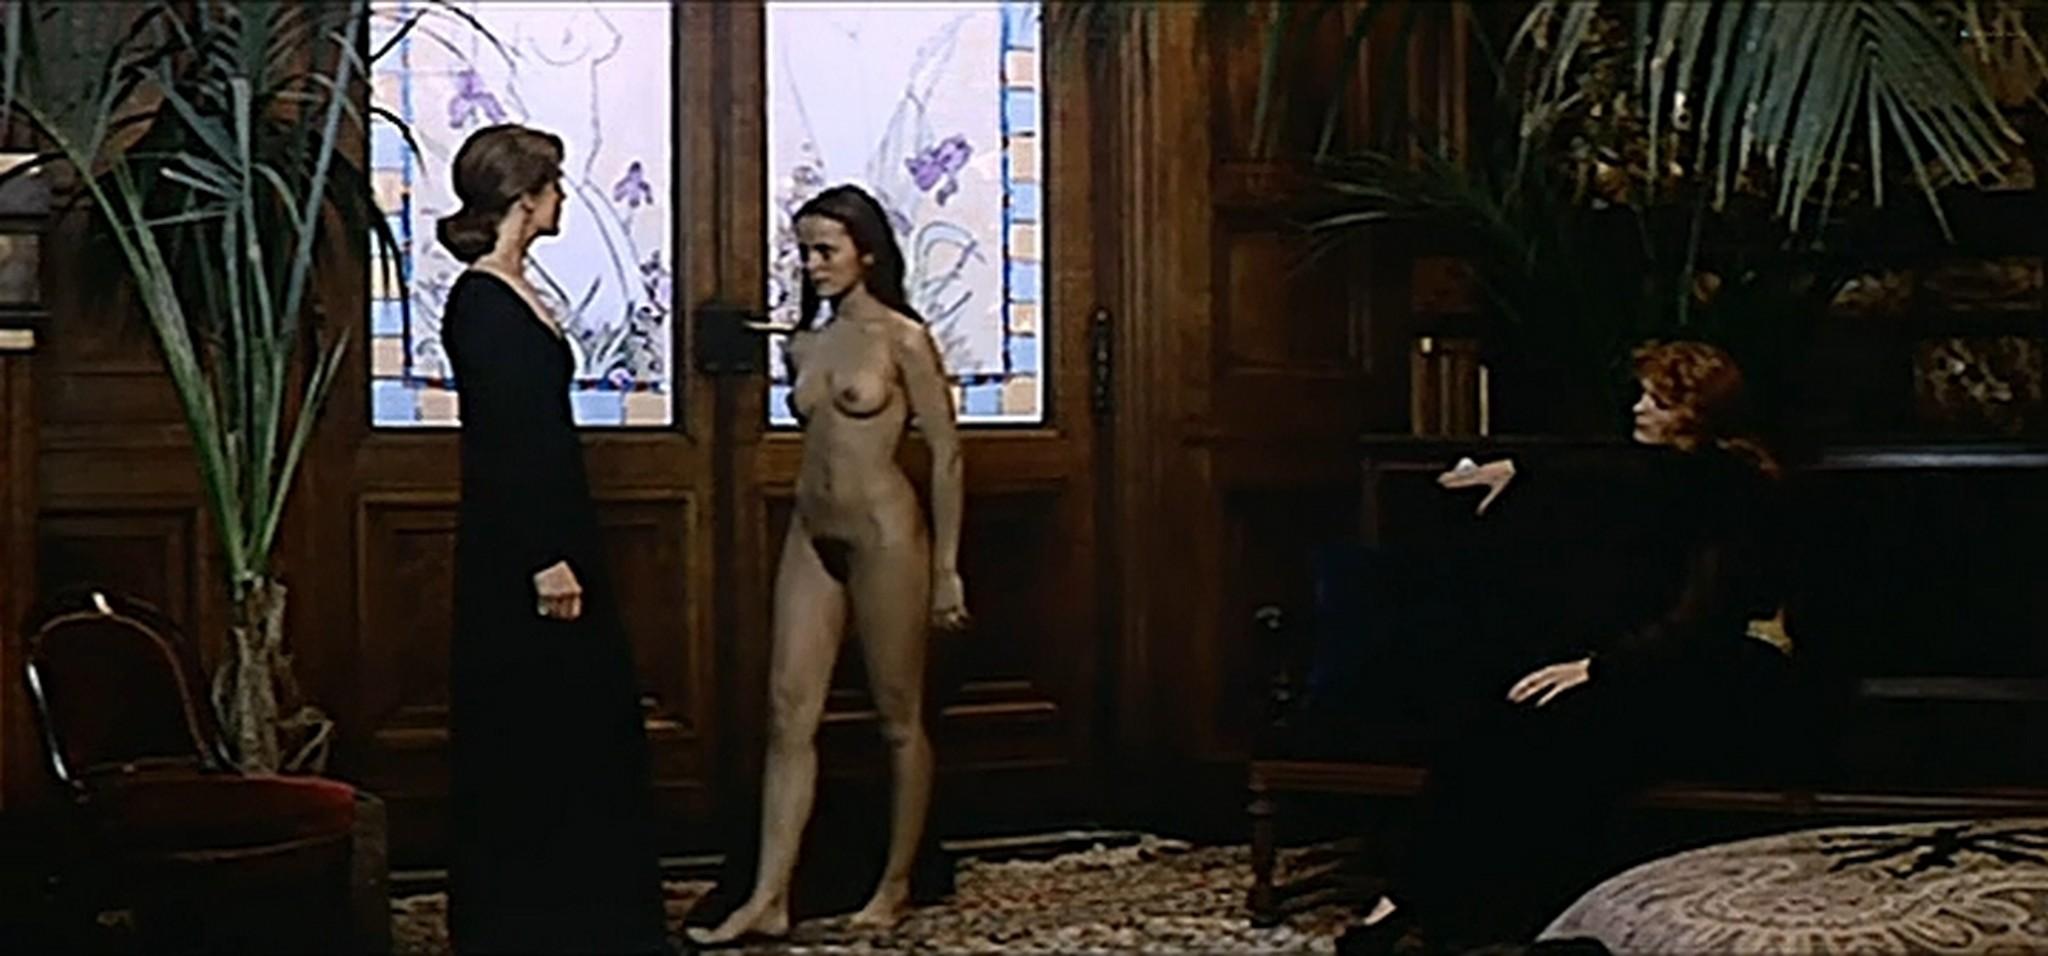 Anicee Alvina nude full frontal Sylvia Kristel and others nude Le jeu avec le feu FR 1975 DVDrip 5